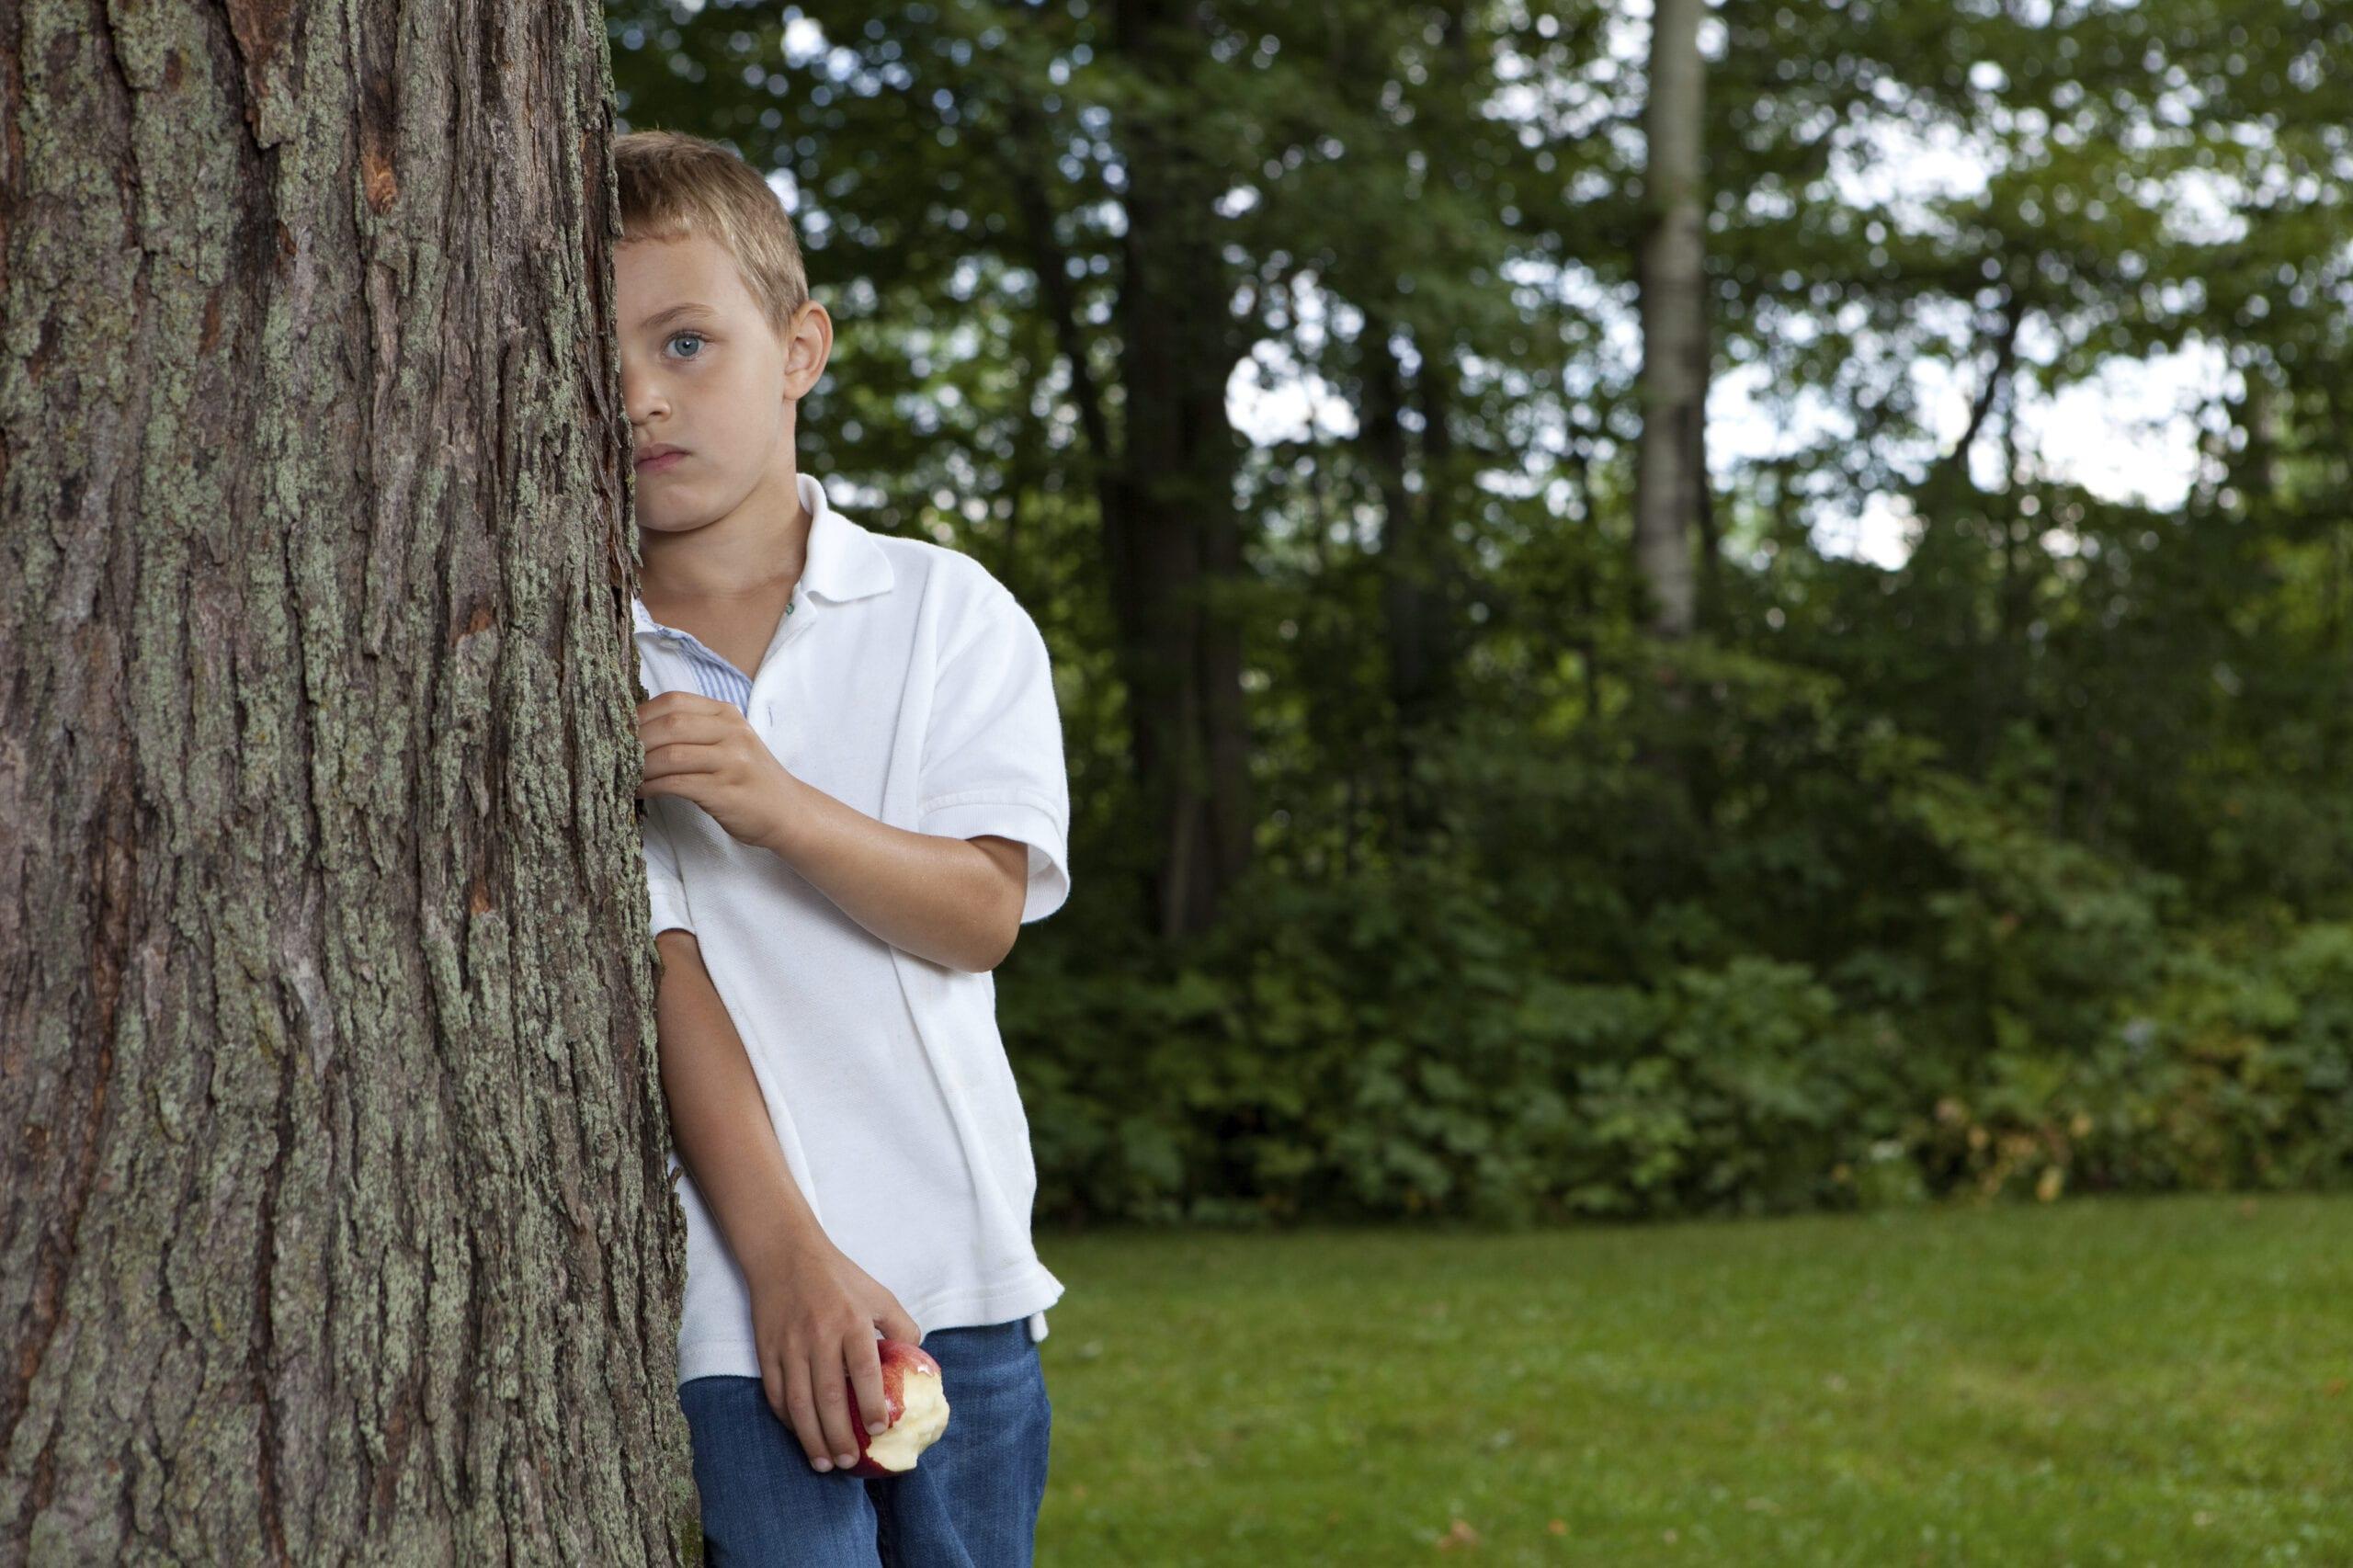 angstbehandling unge